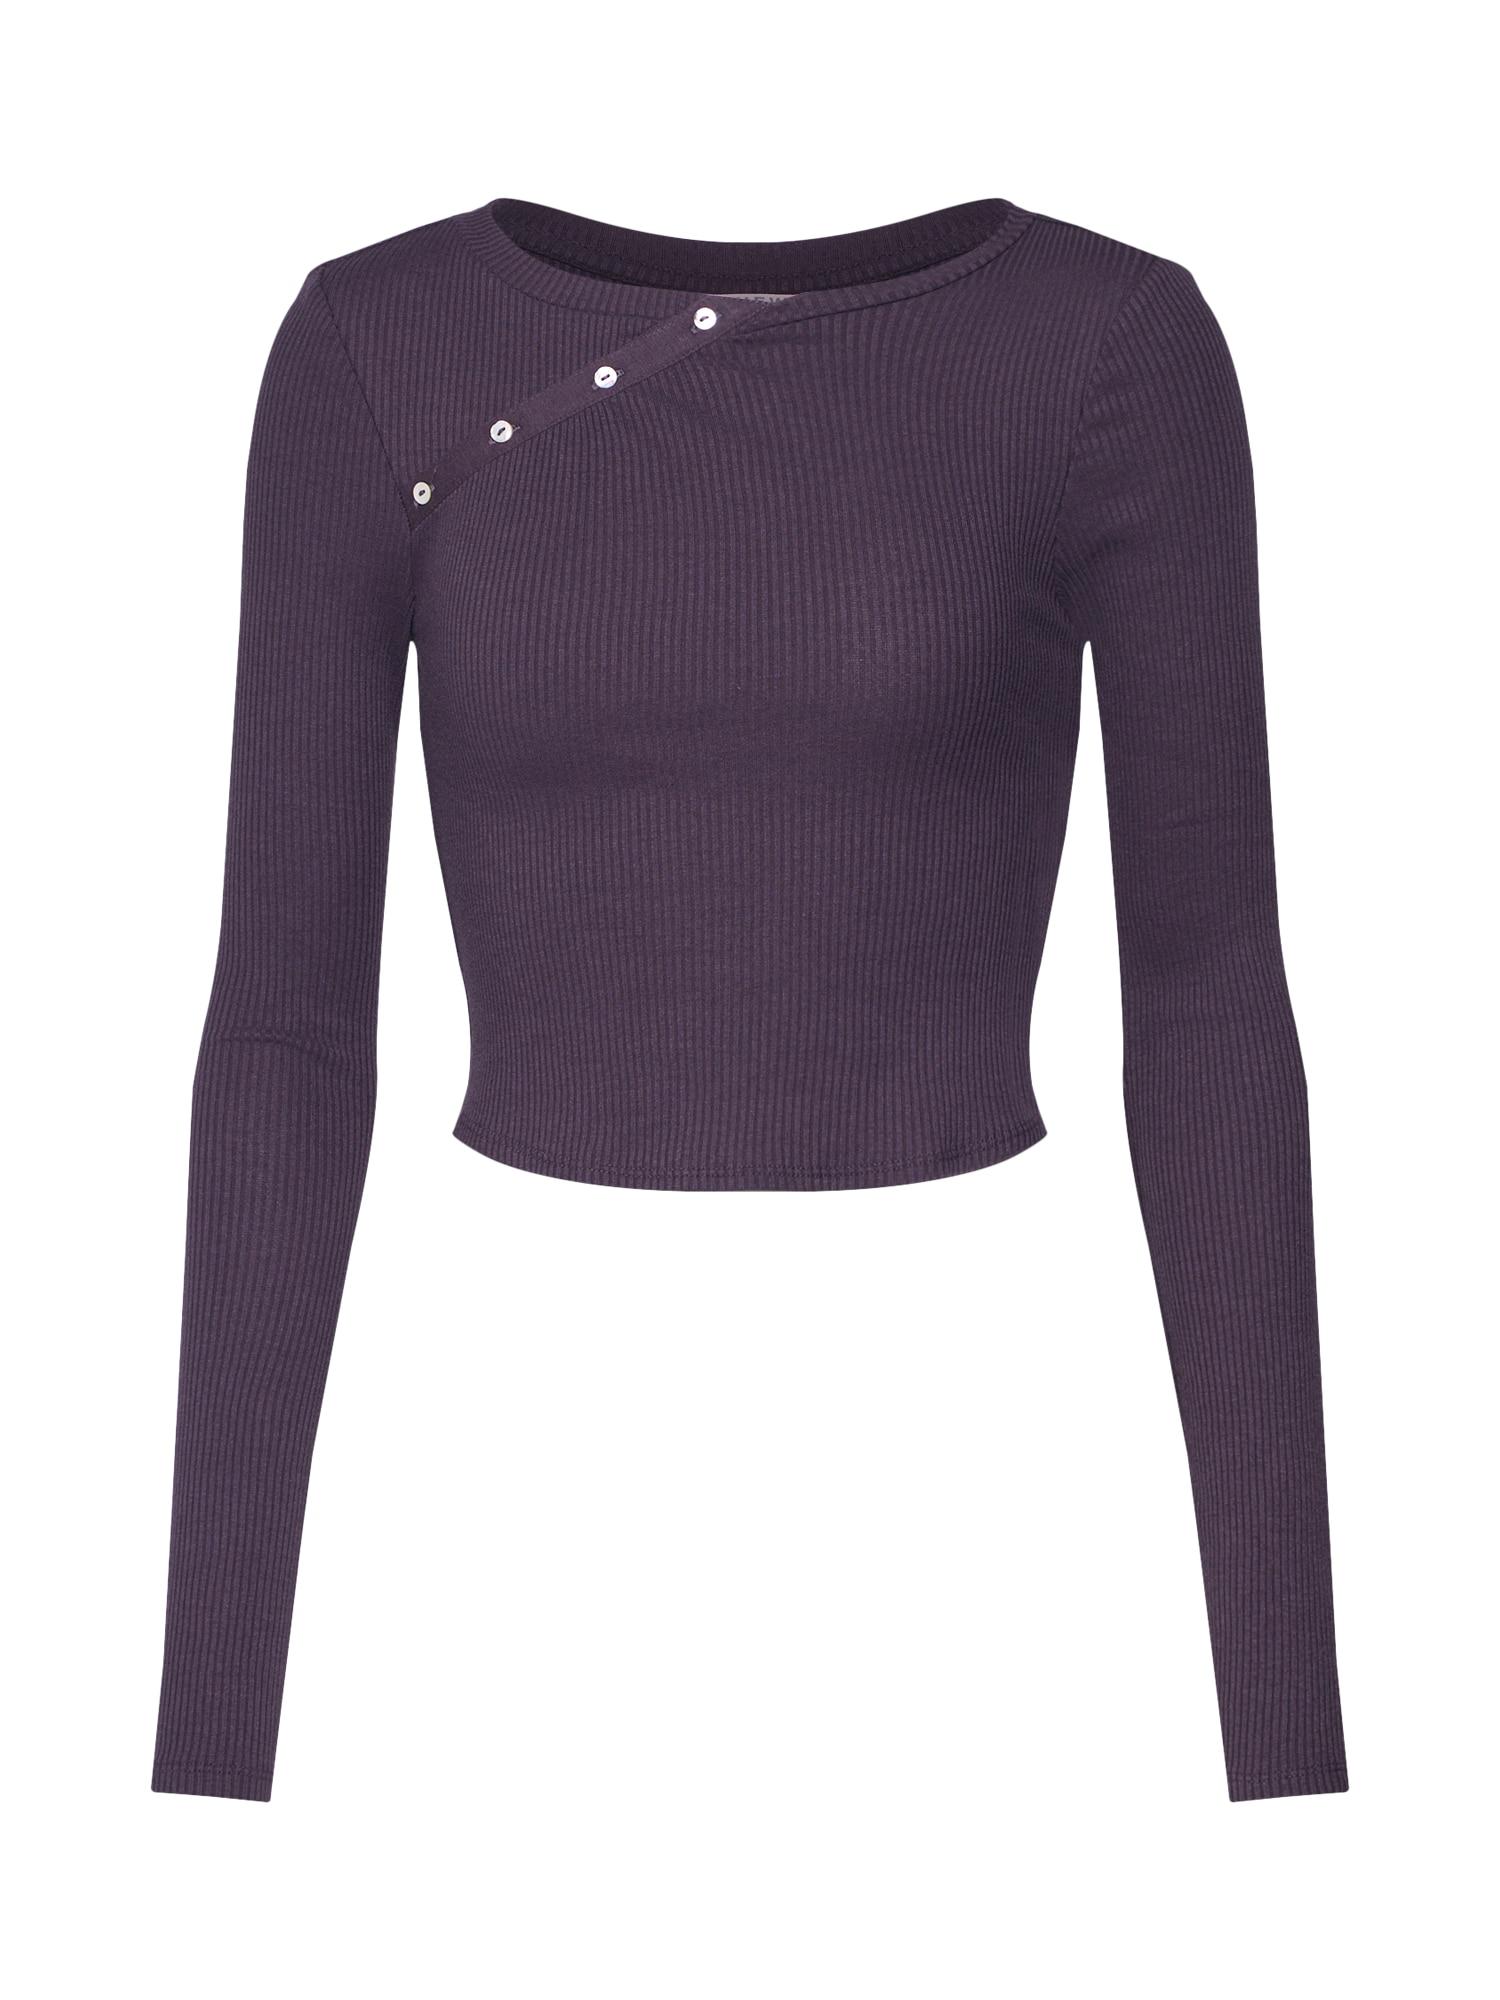 Tričko tmavě fialová Review